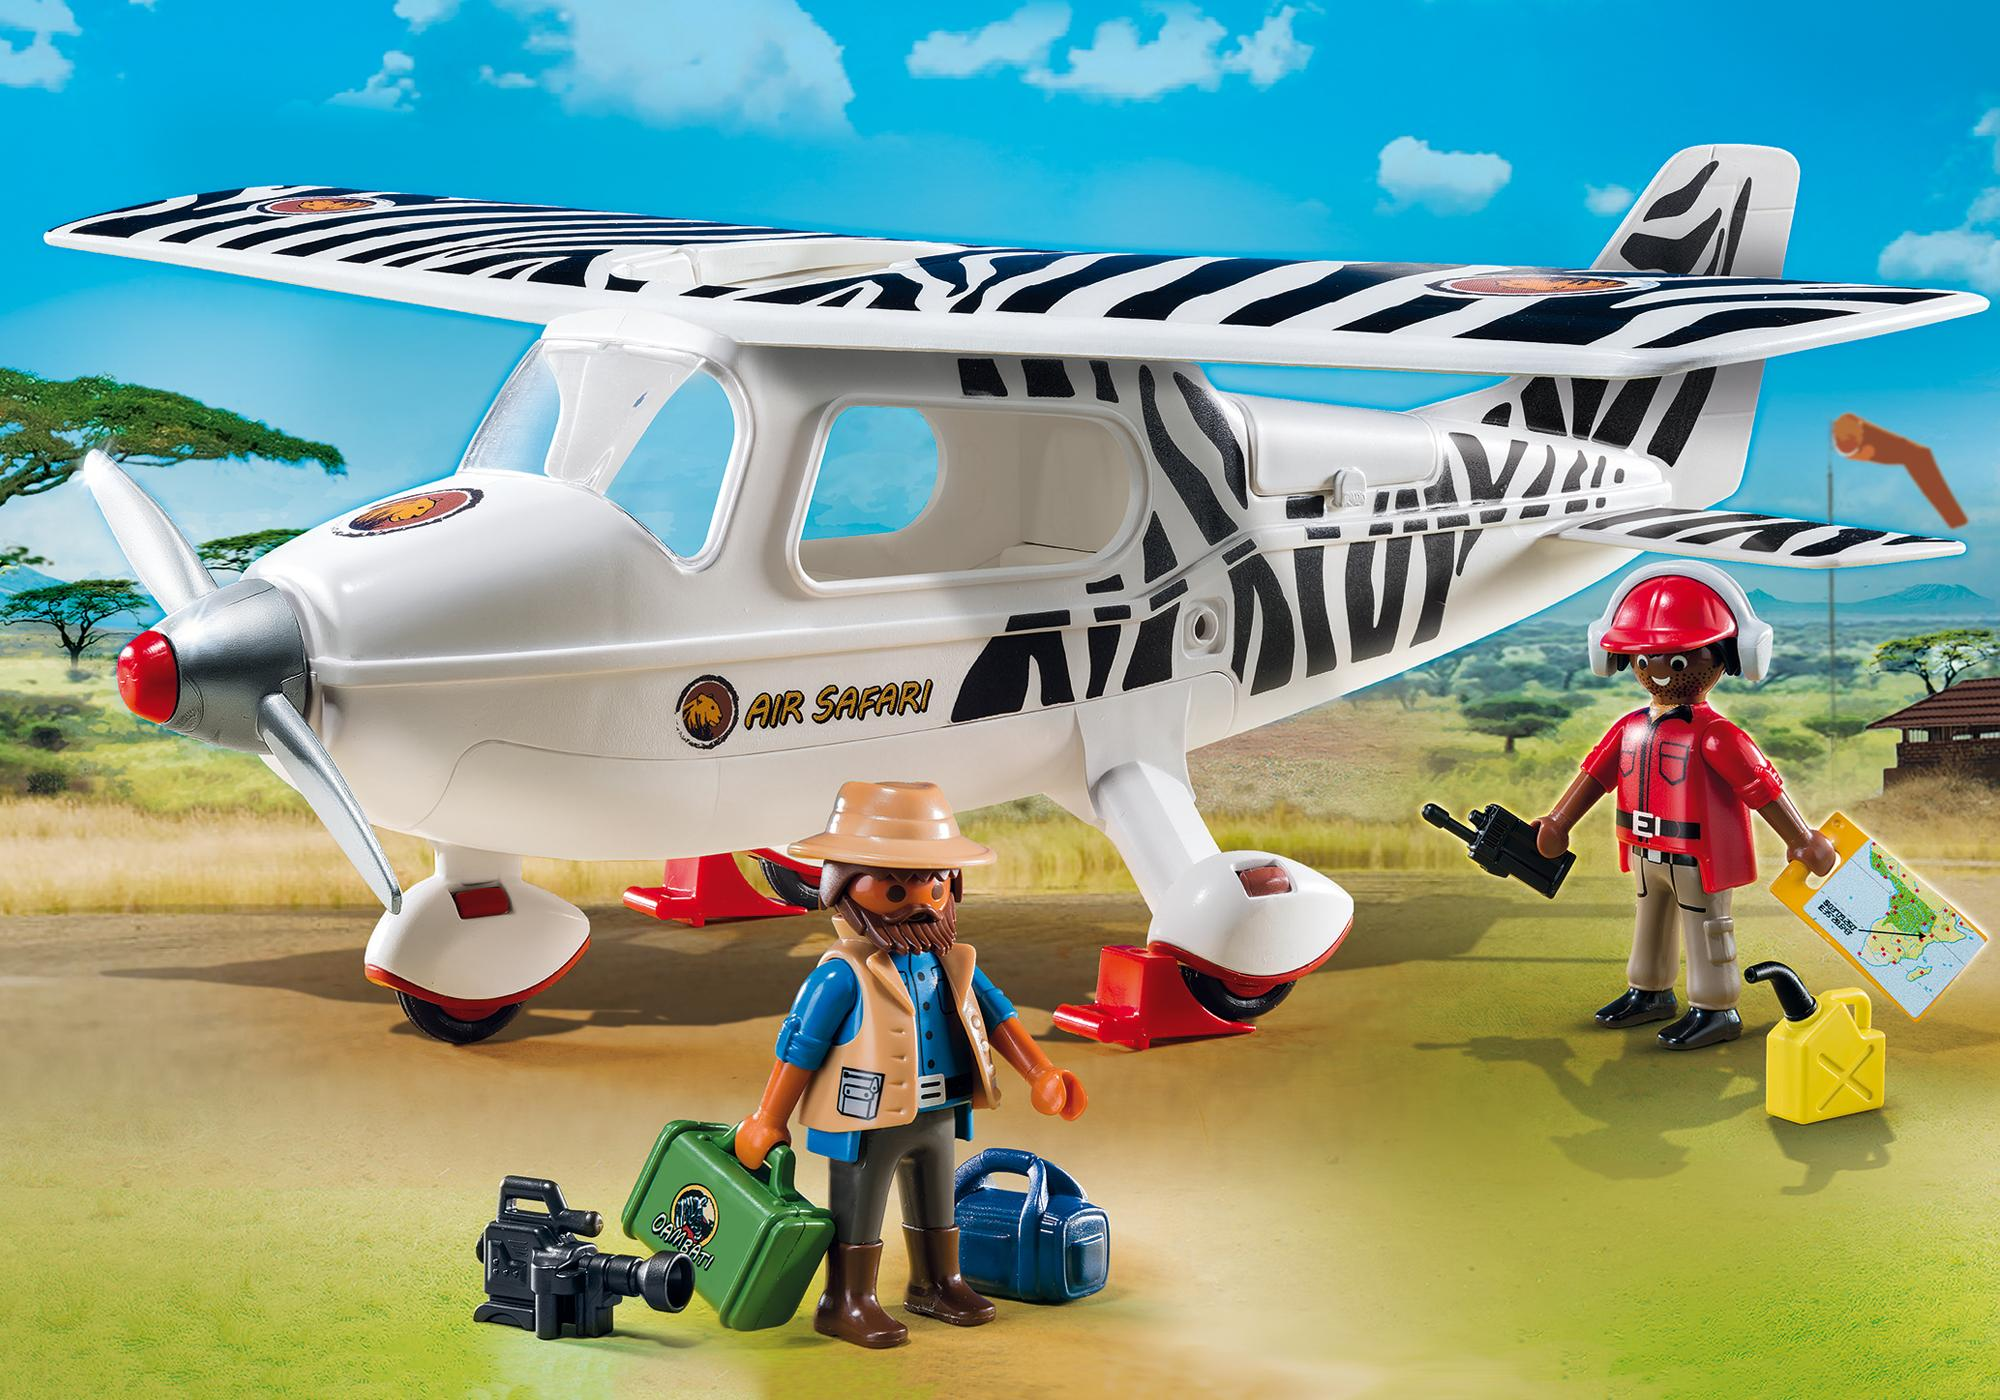 http://media.playmobil.com/i/playmobil/6938_product_detail/Aereo di avvistamento fly-safari